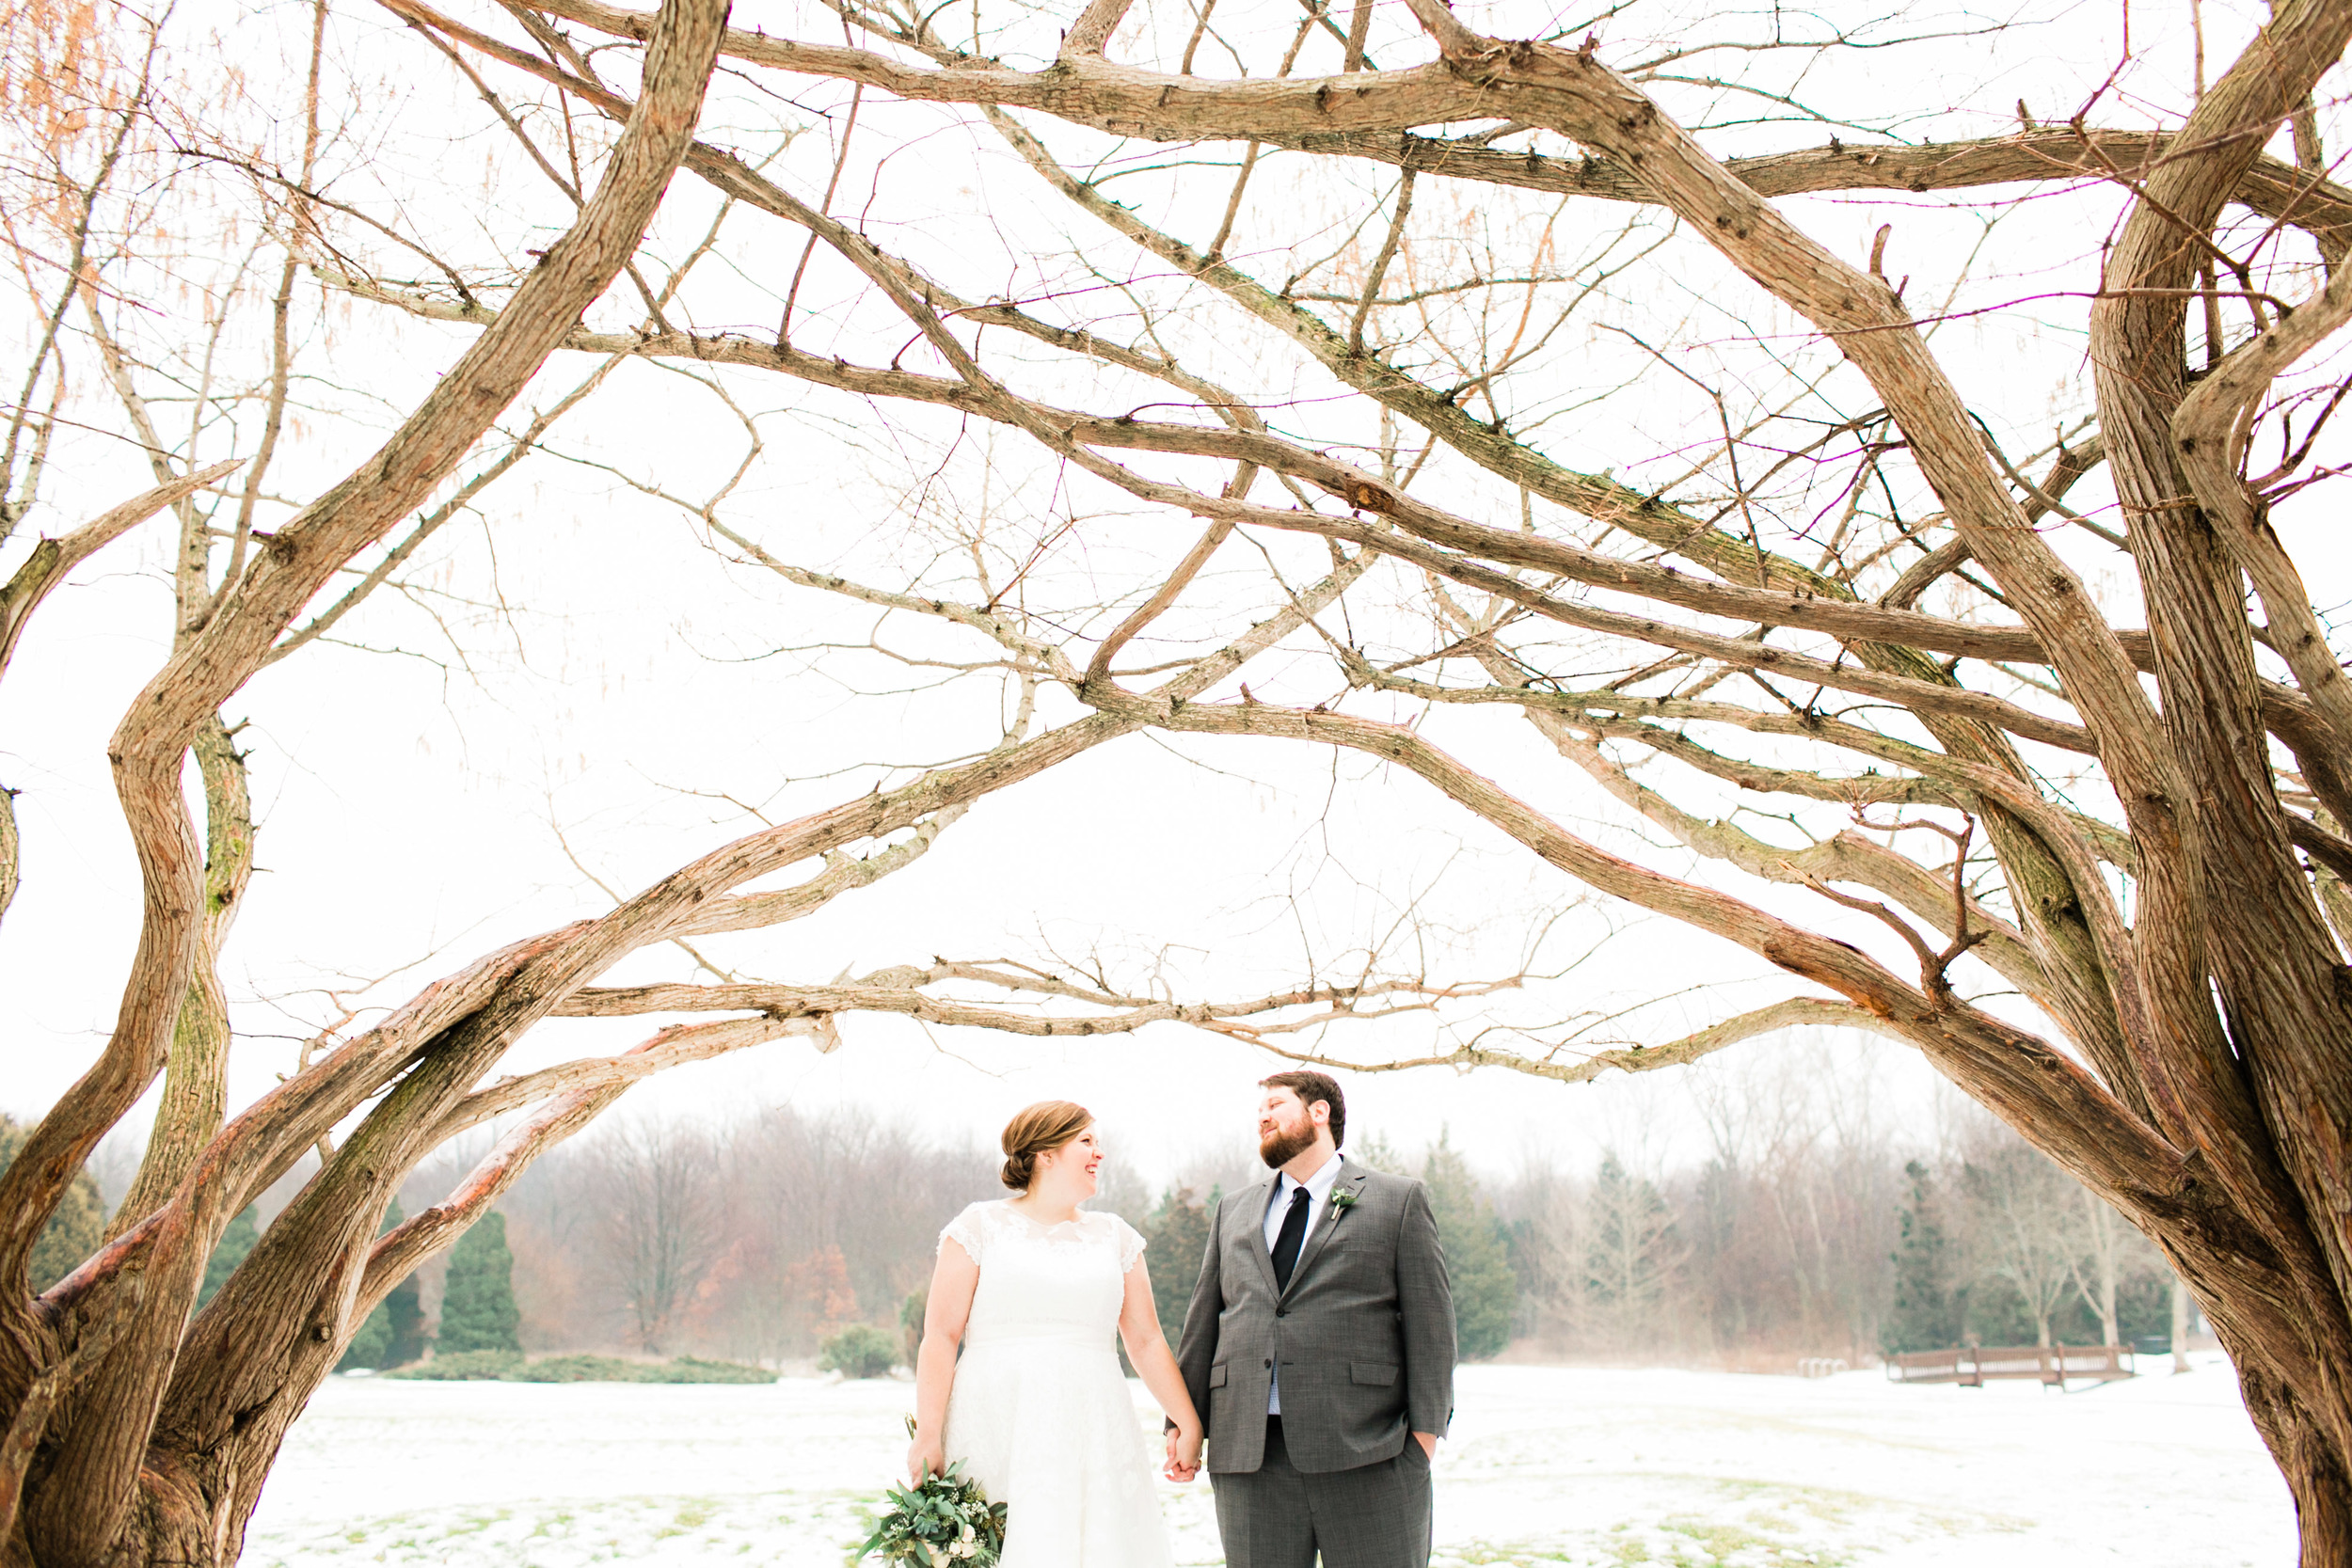 mayden photography_bridal portraits-25.jpg